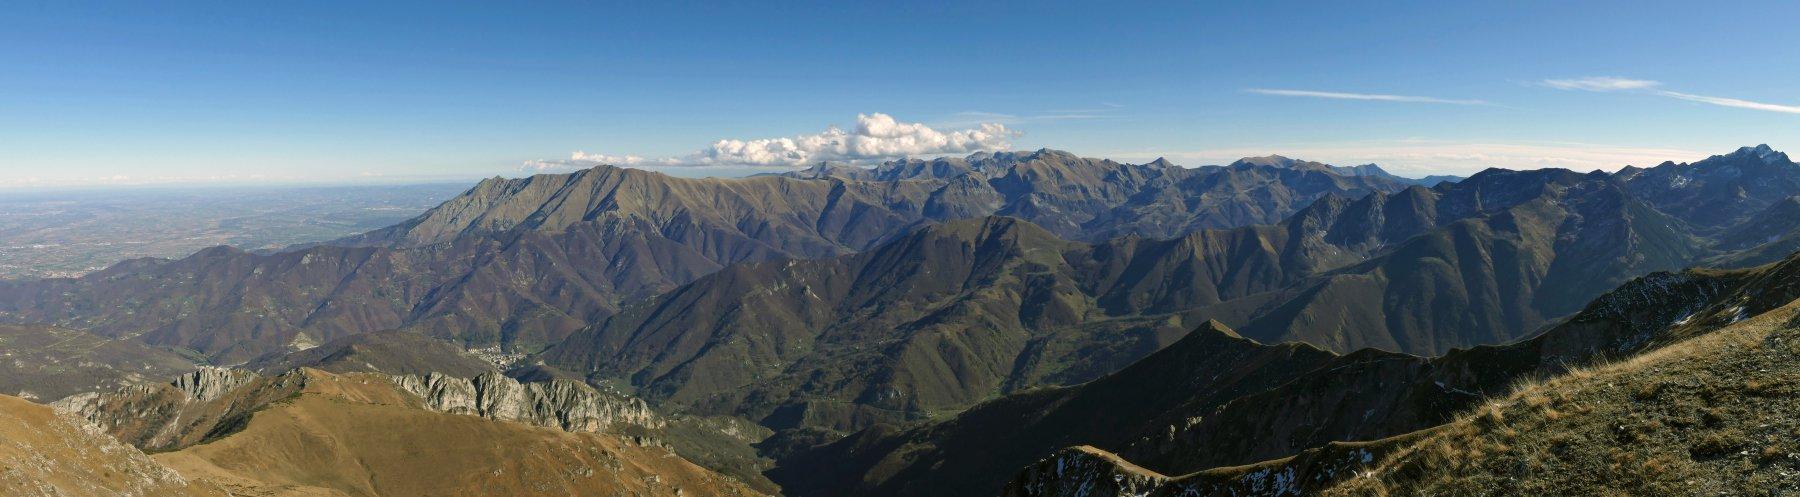 Panoramica verso le Alpi Liguri